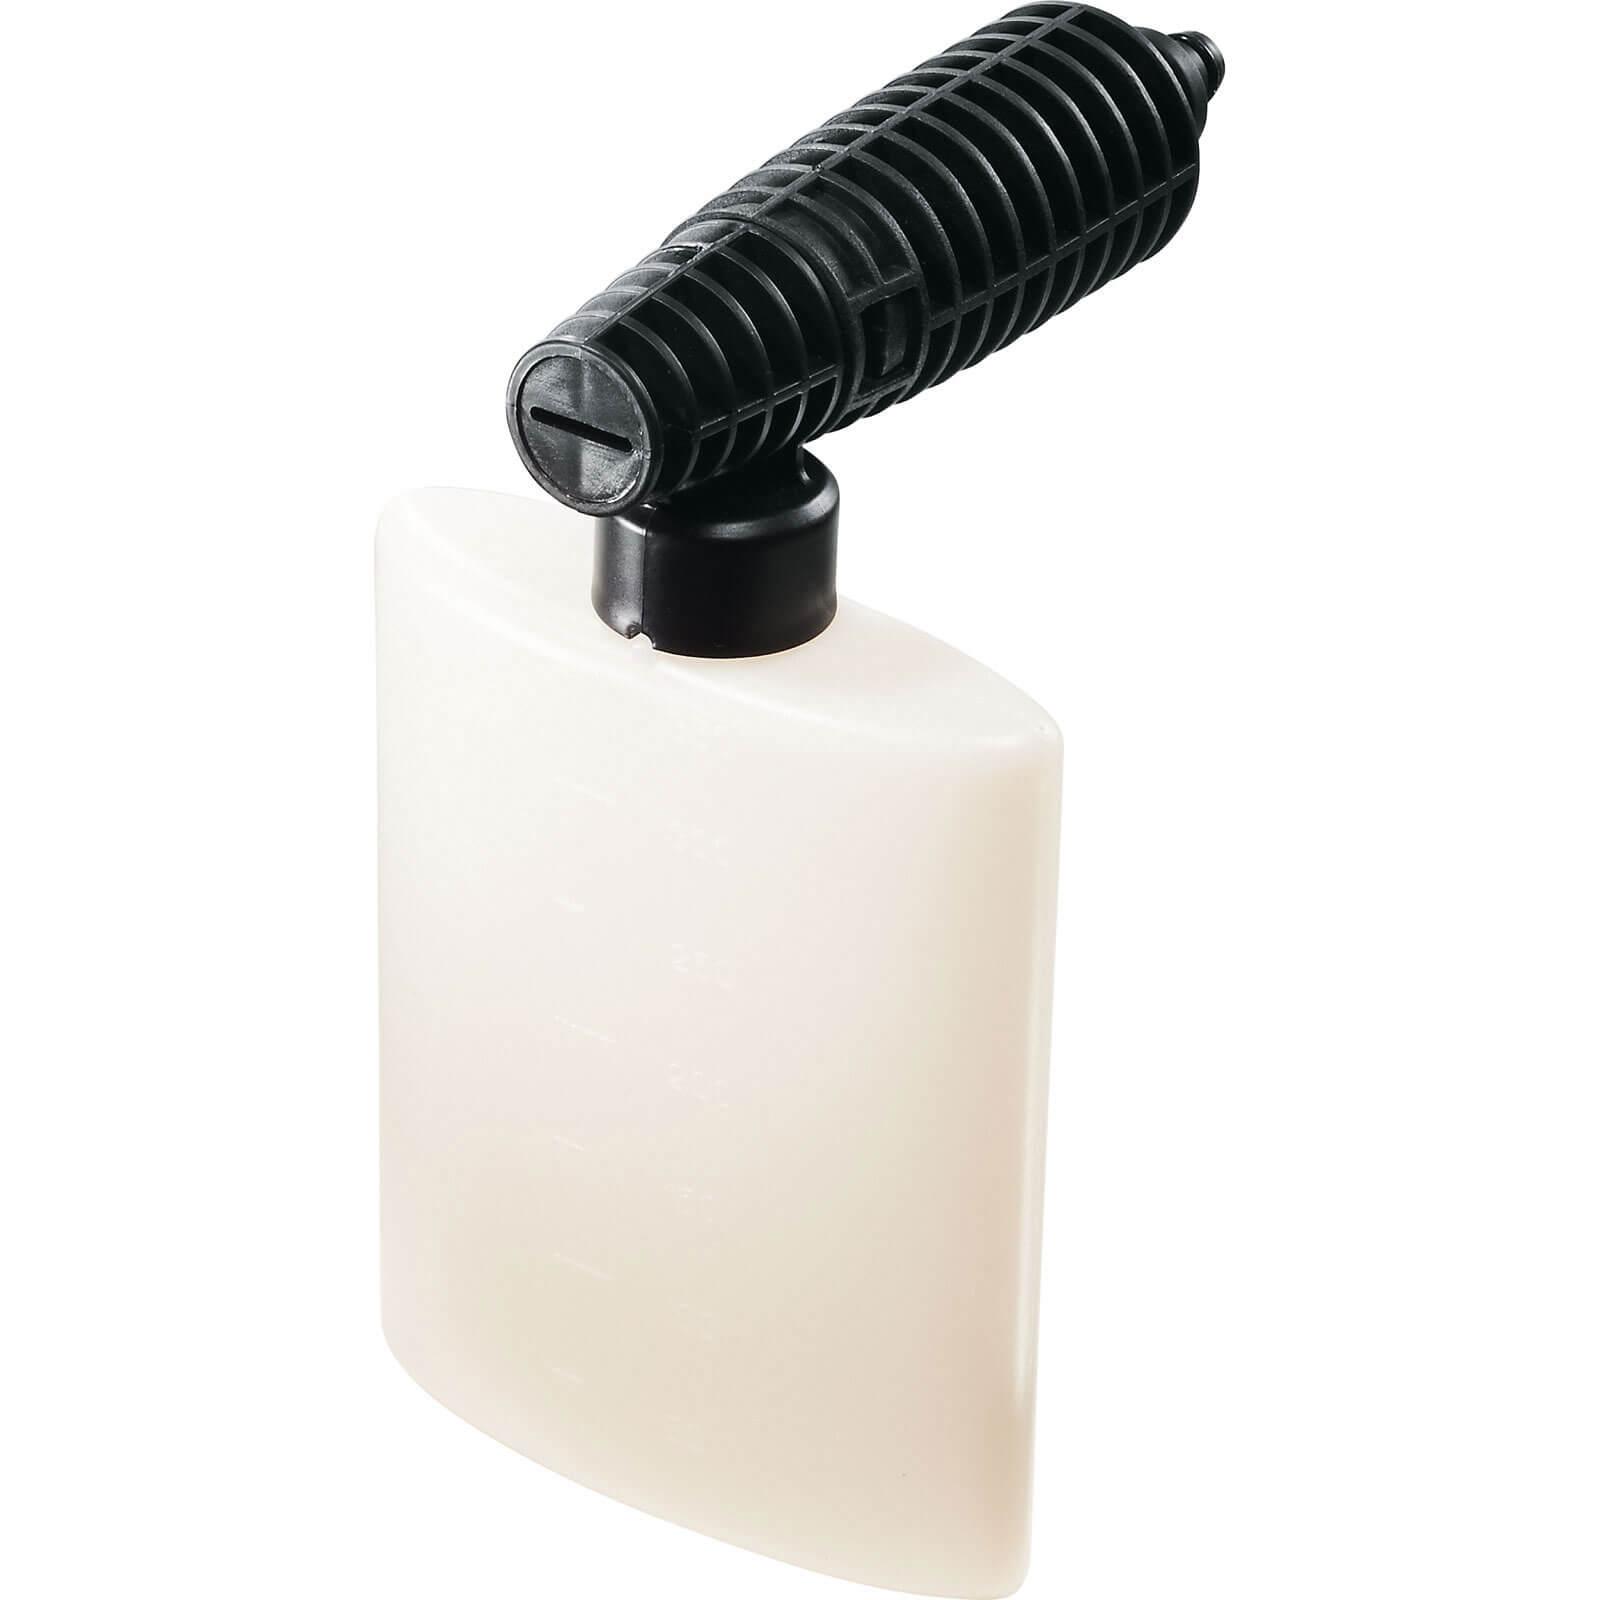 Bosch High Pressure Detergent nozzle for AQT 33-10, 35-12 & 37-13 Pressure Washers